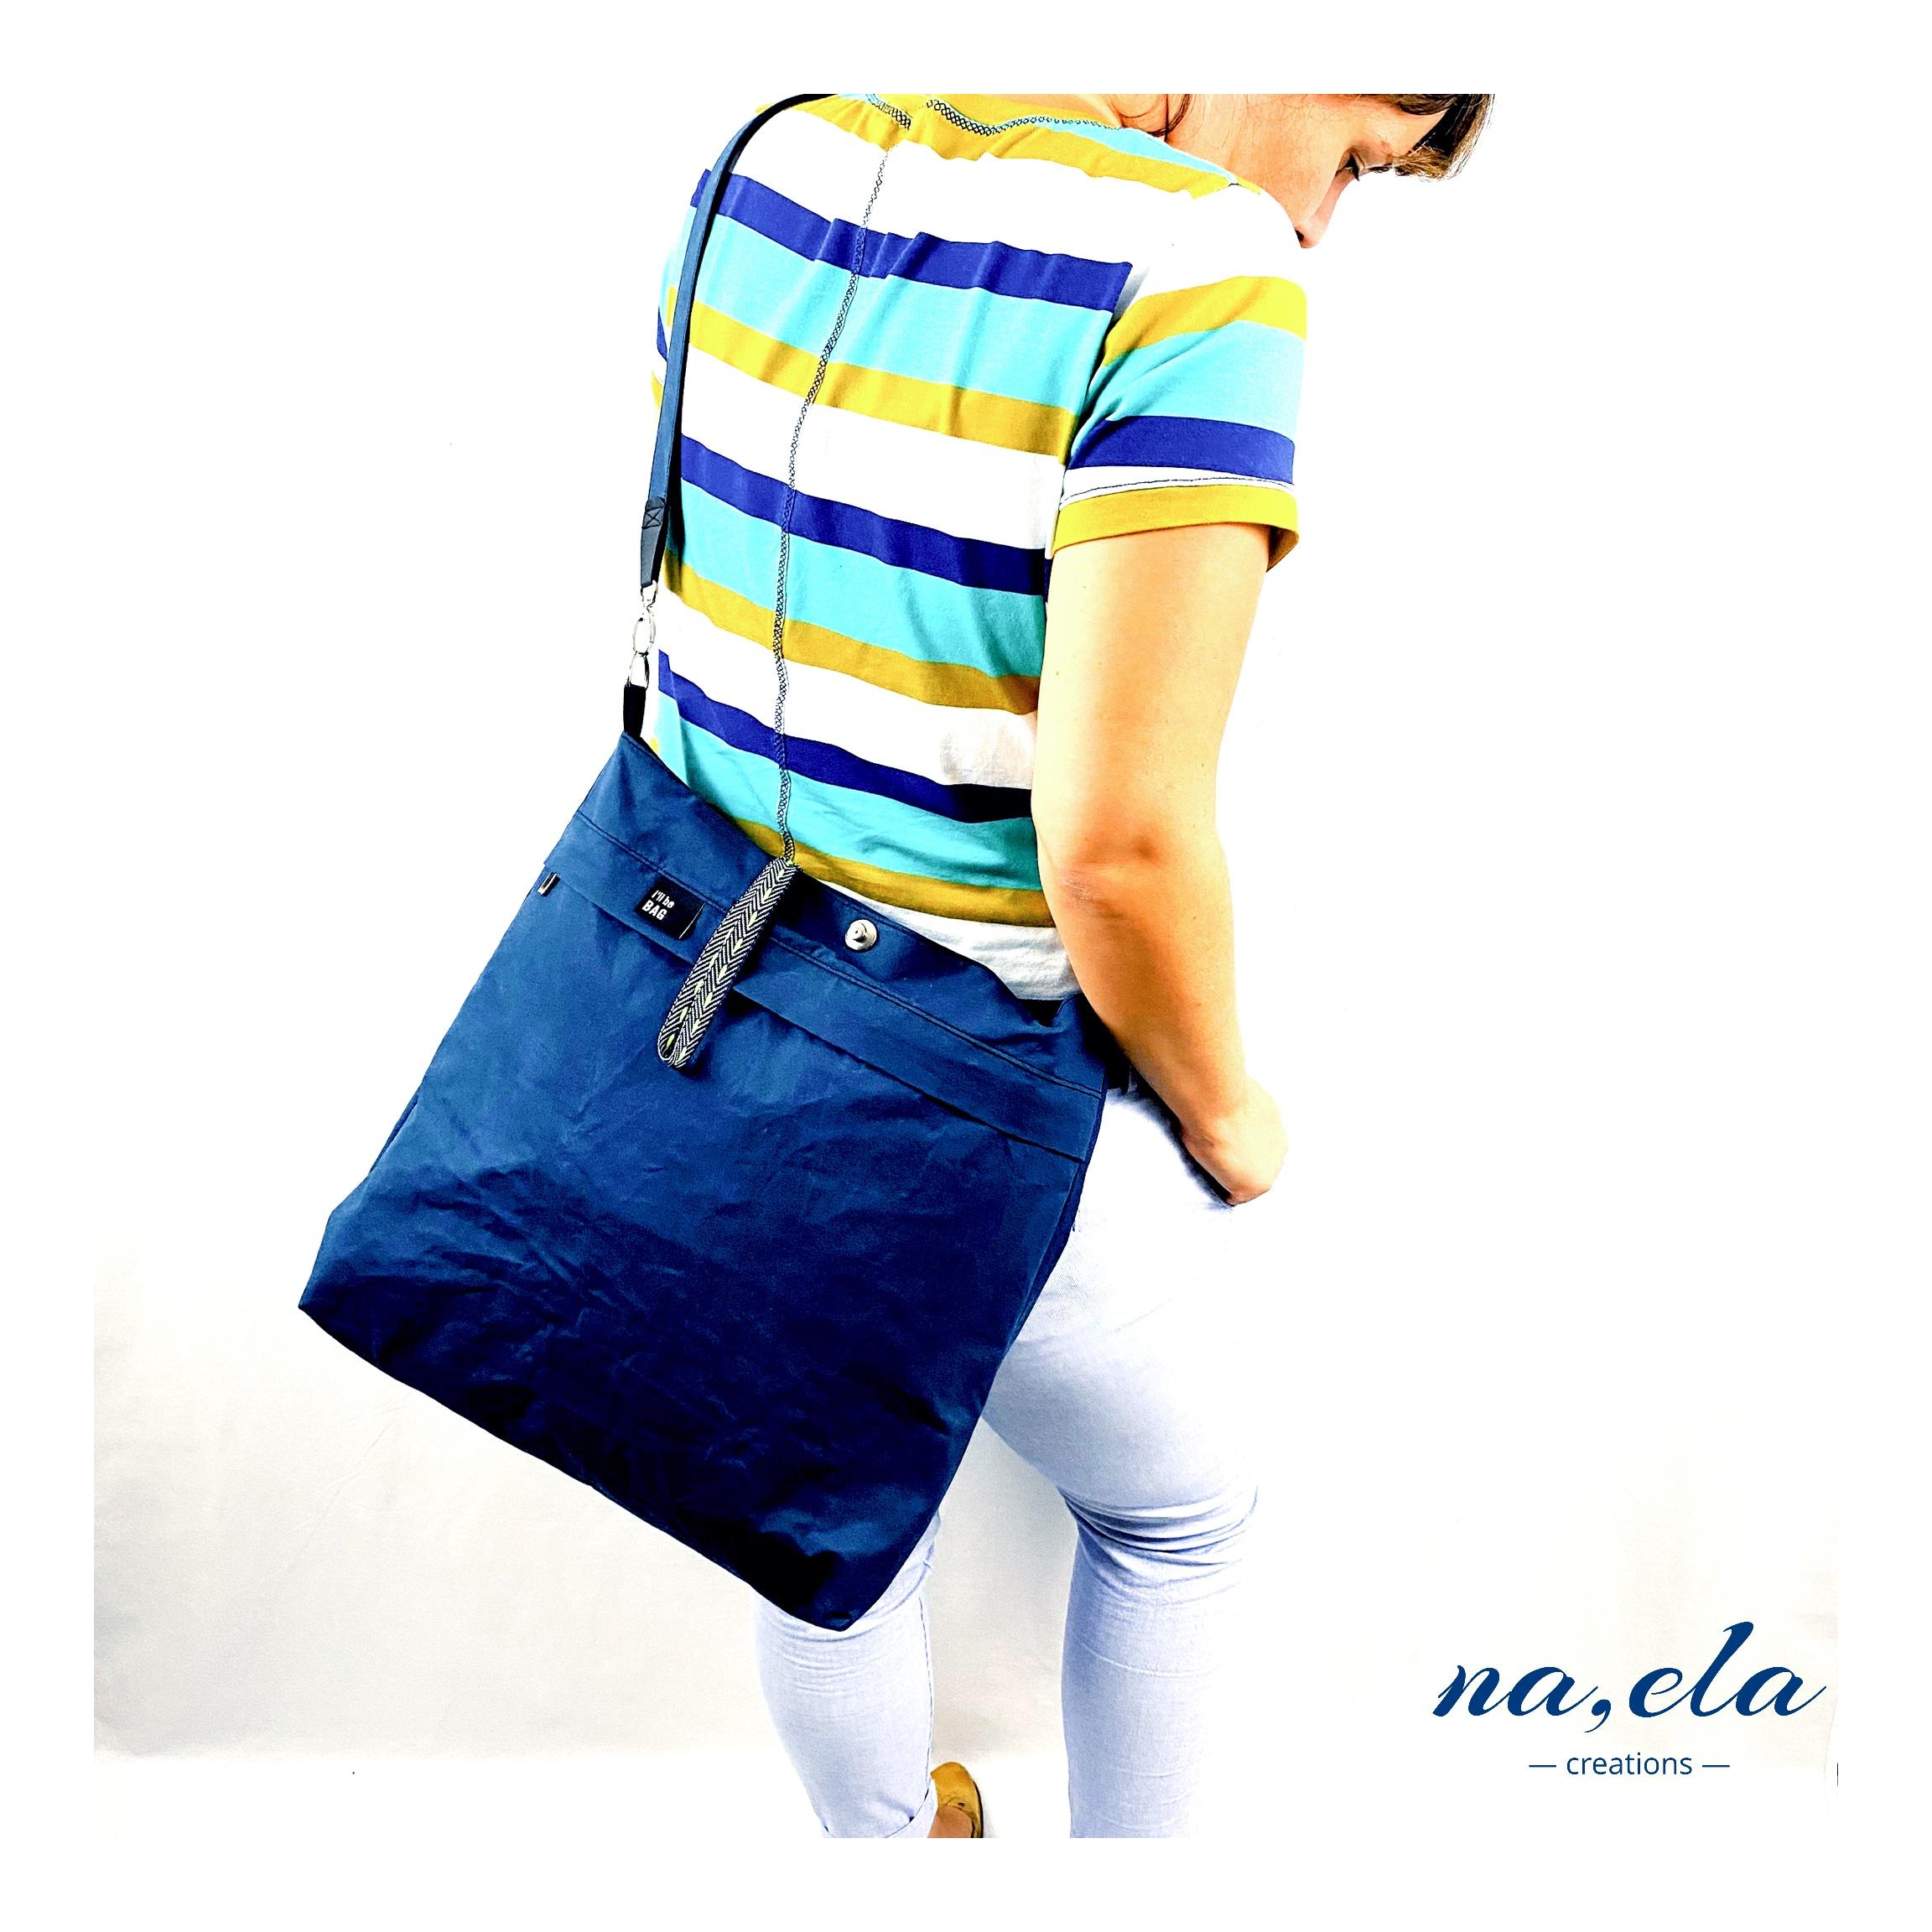 My Blu Yello Bag